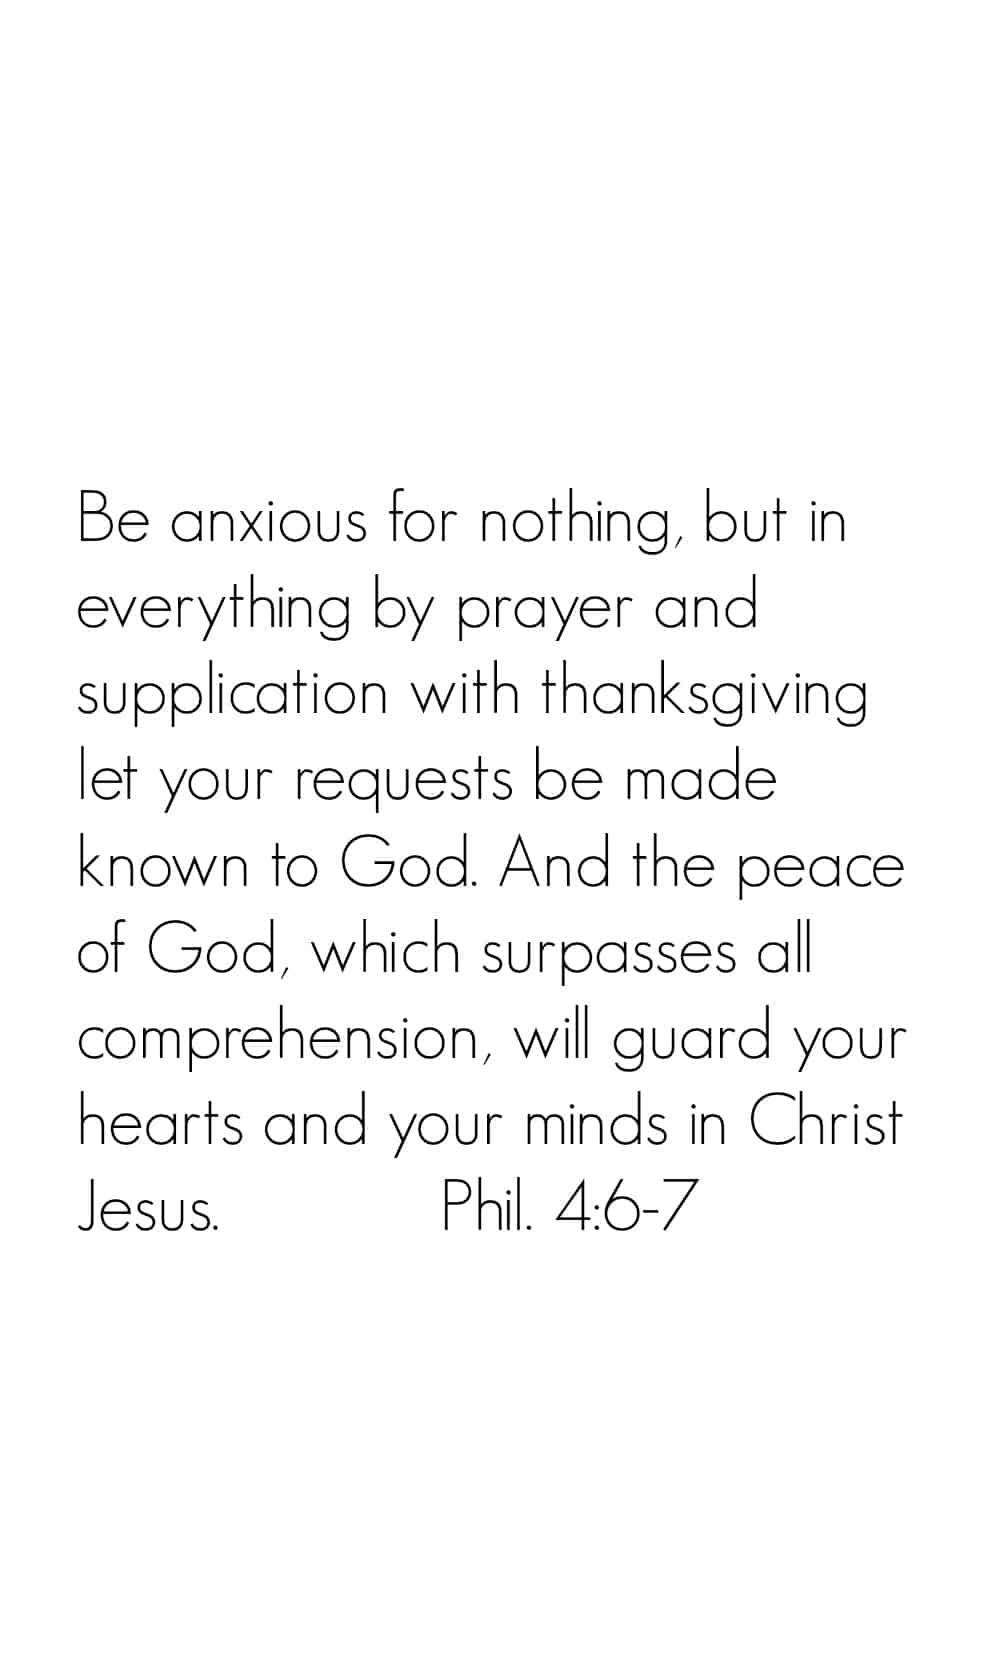 Christian Fall Iphone Wallpaper Philippians 4 6 7 Bible Verse Iphone Wallpaper